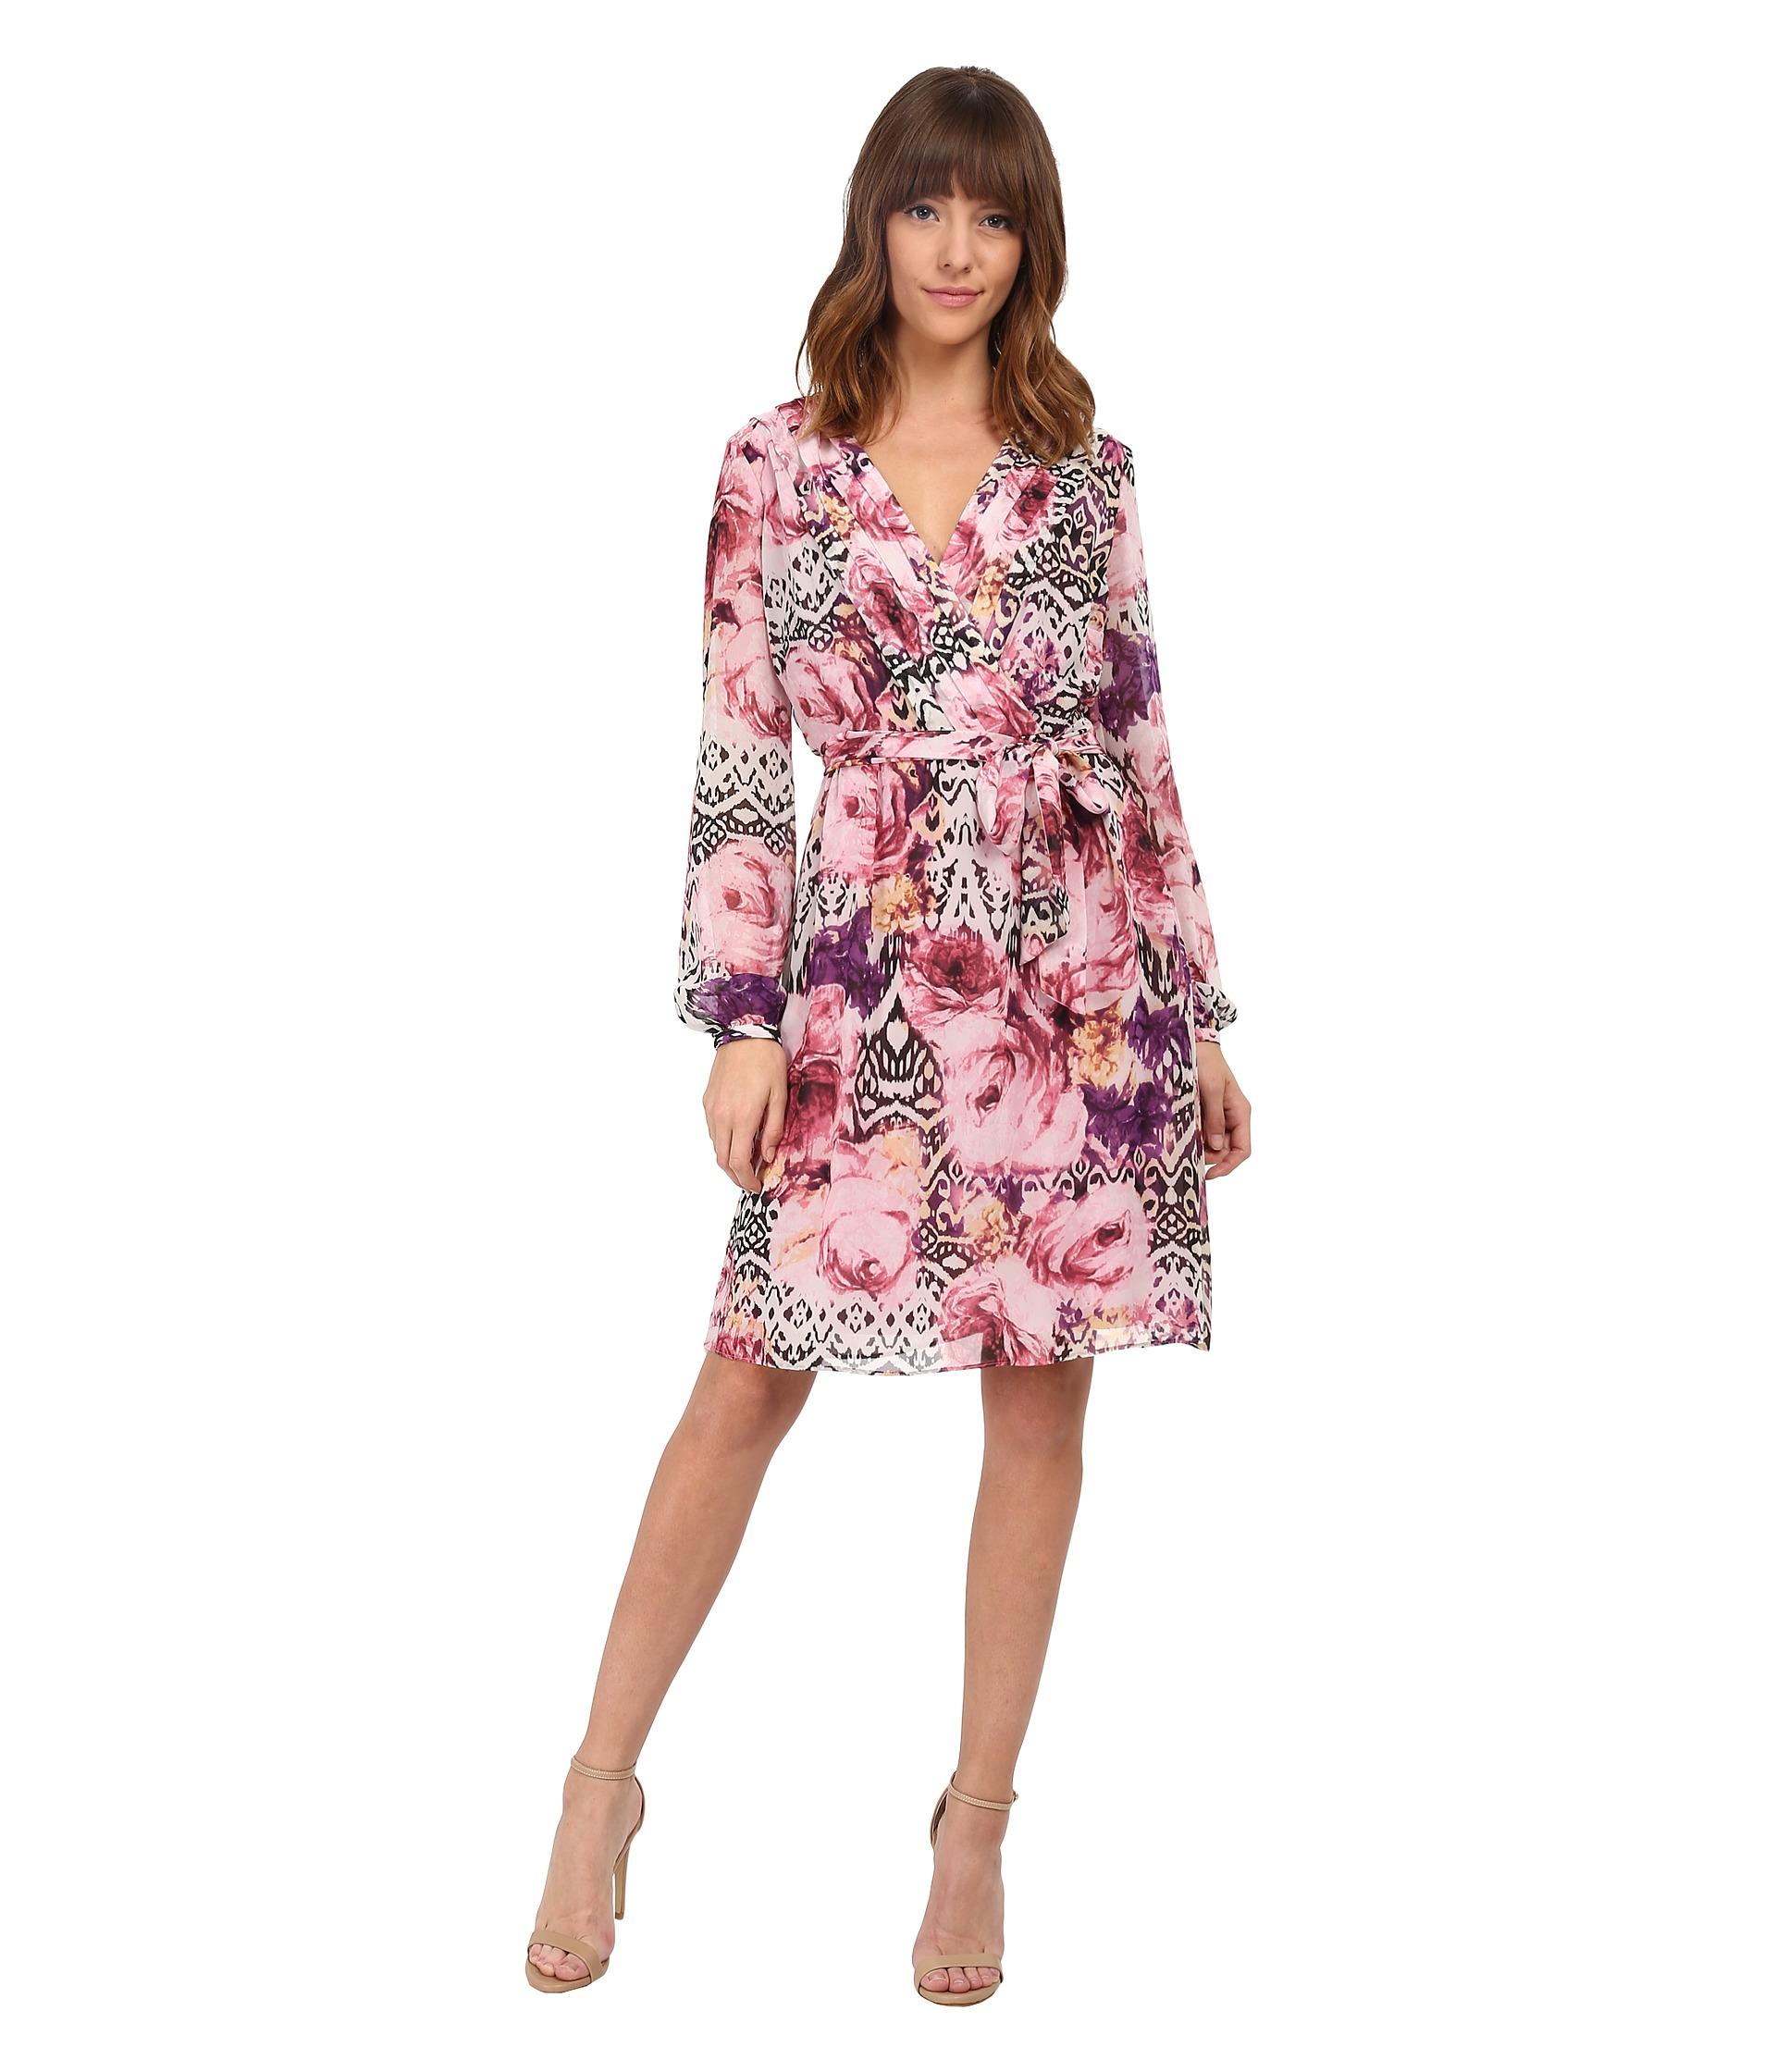 647b8330f866 Lyst - Jessica Simpson Chiffon Long Sleeve Floral Dress in Pink